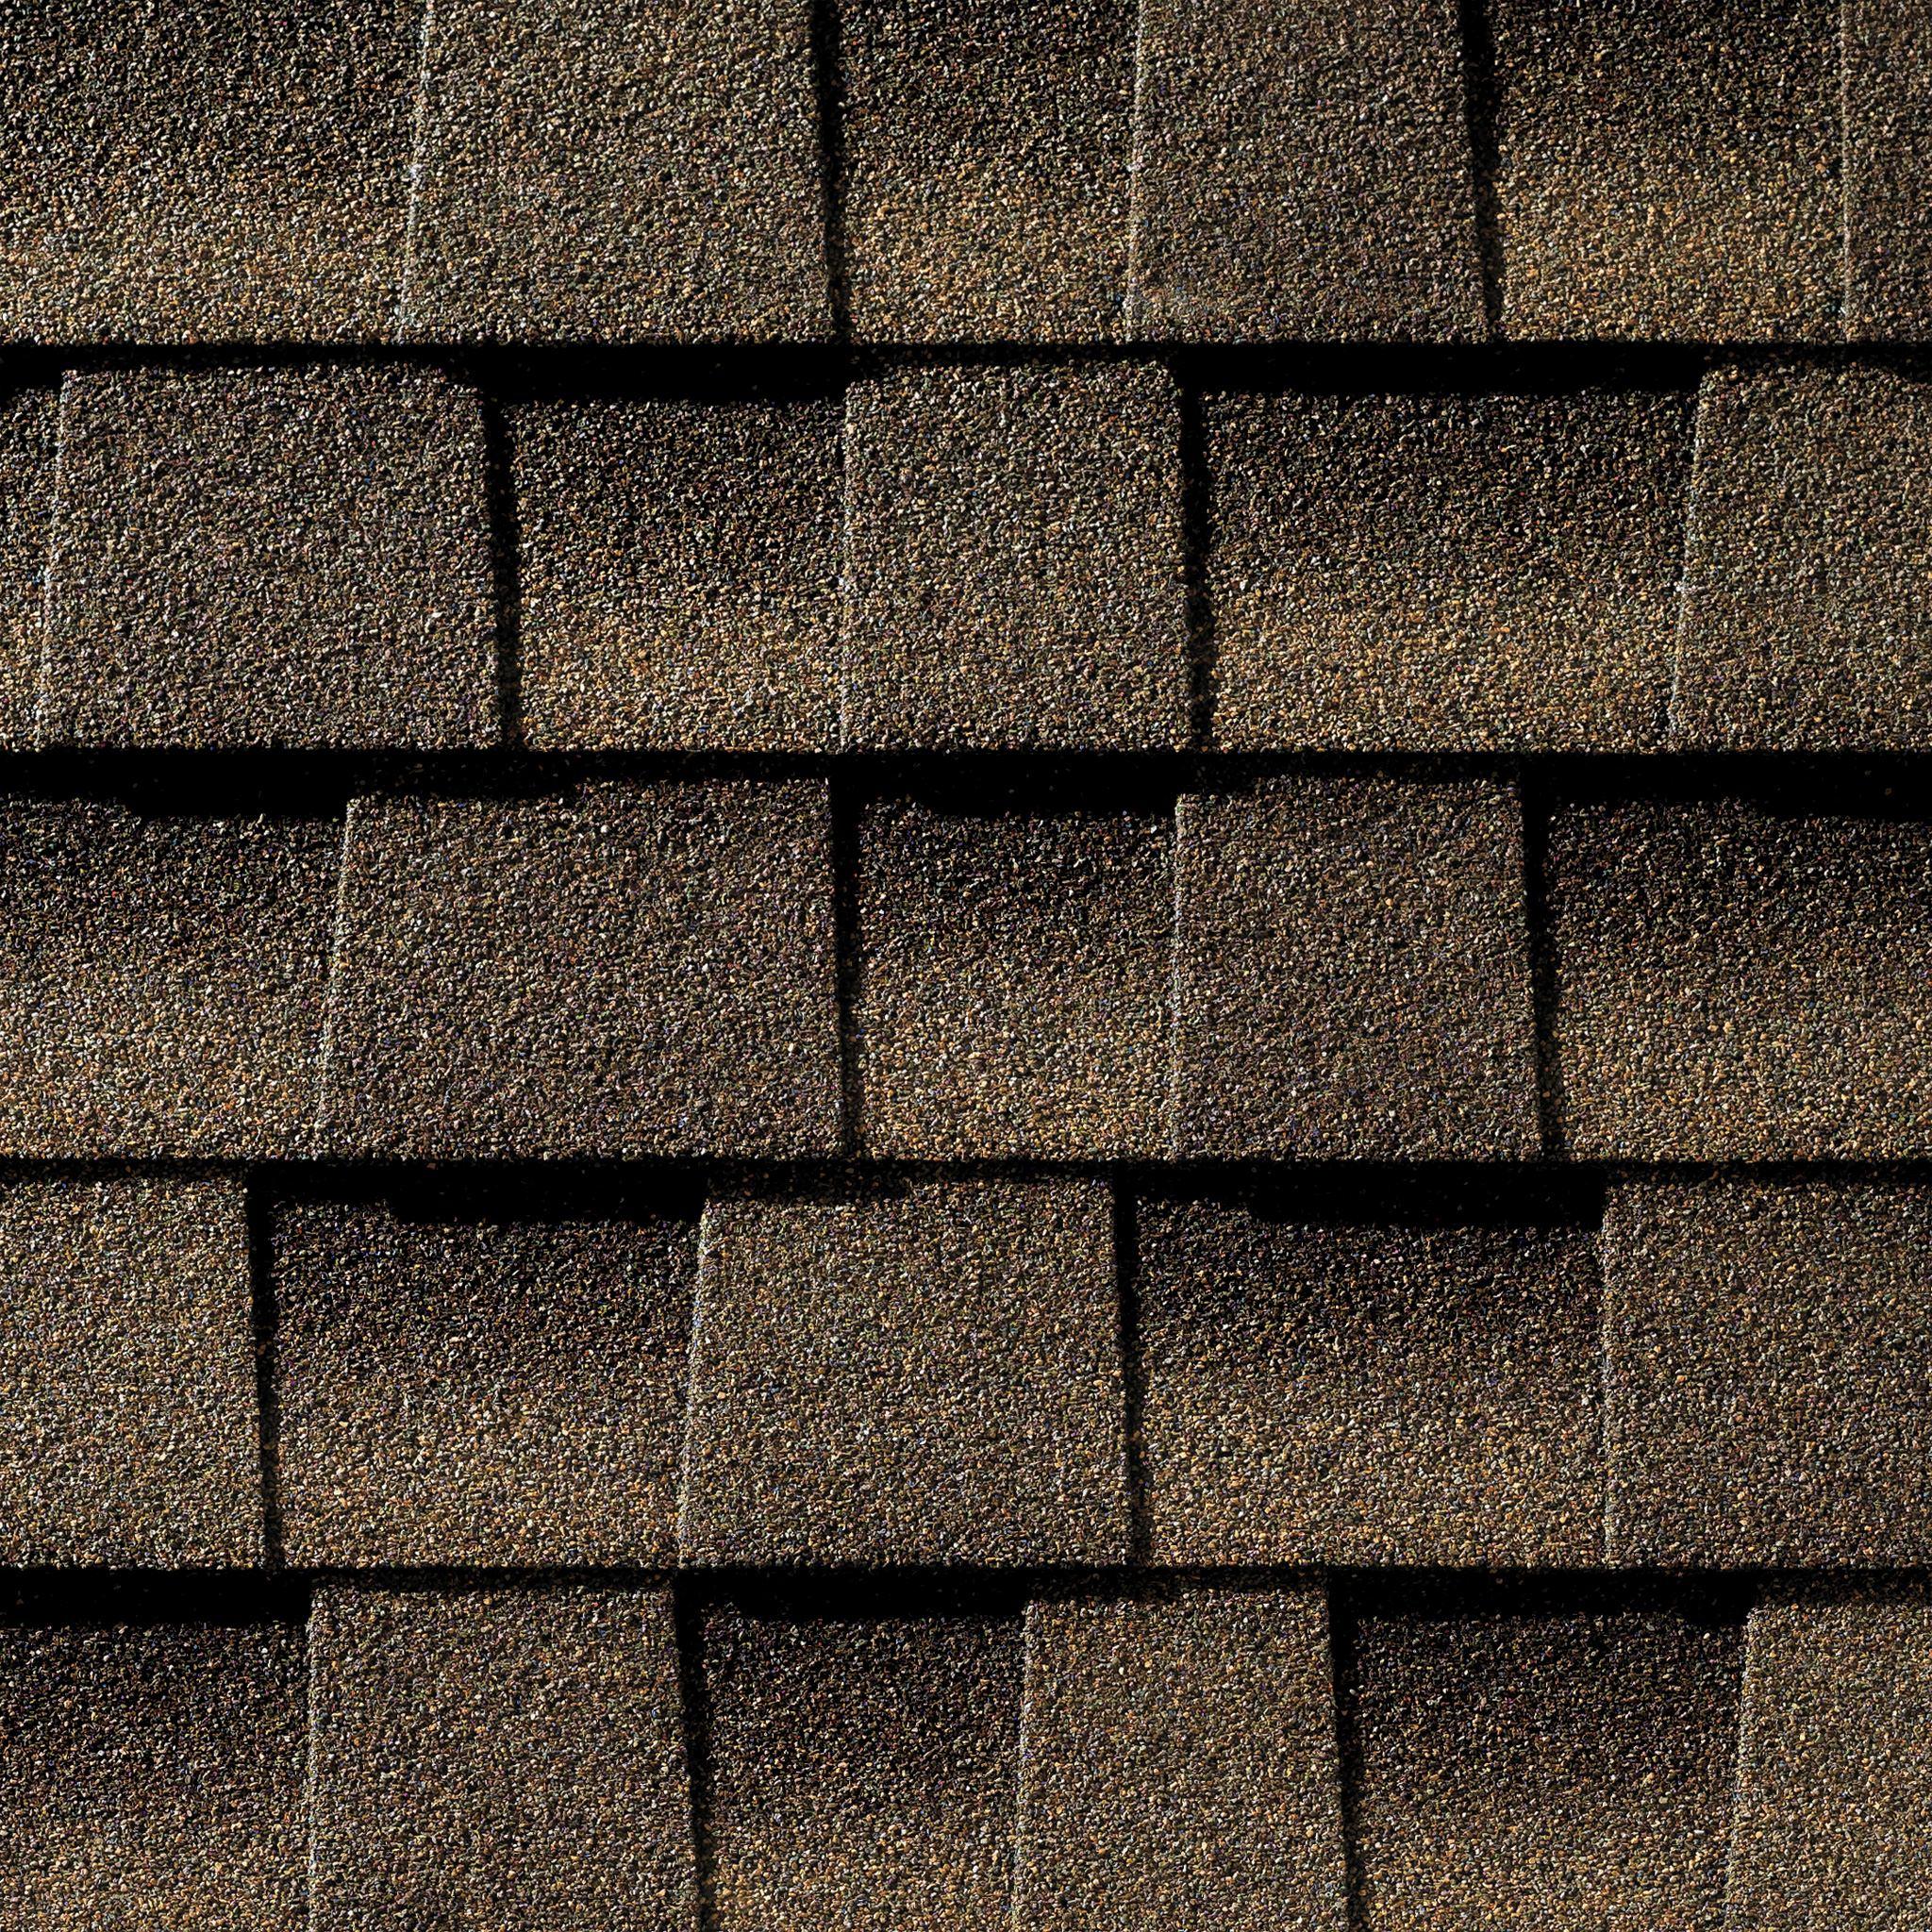 Close up photo of GAF's Timberline Ultra HD Barkwood shingle swatch